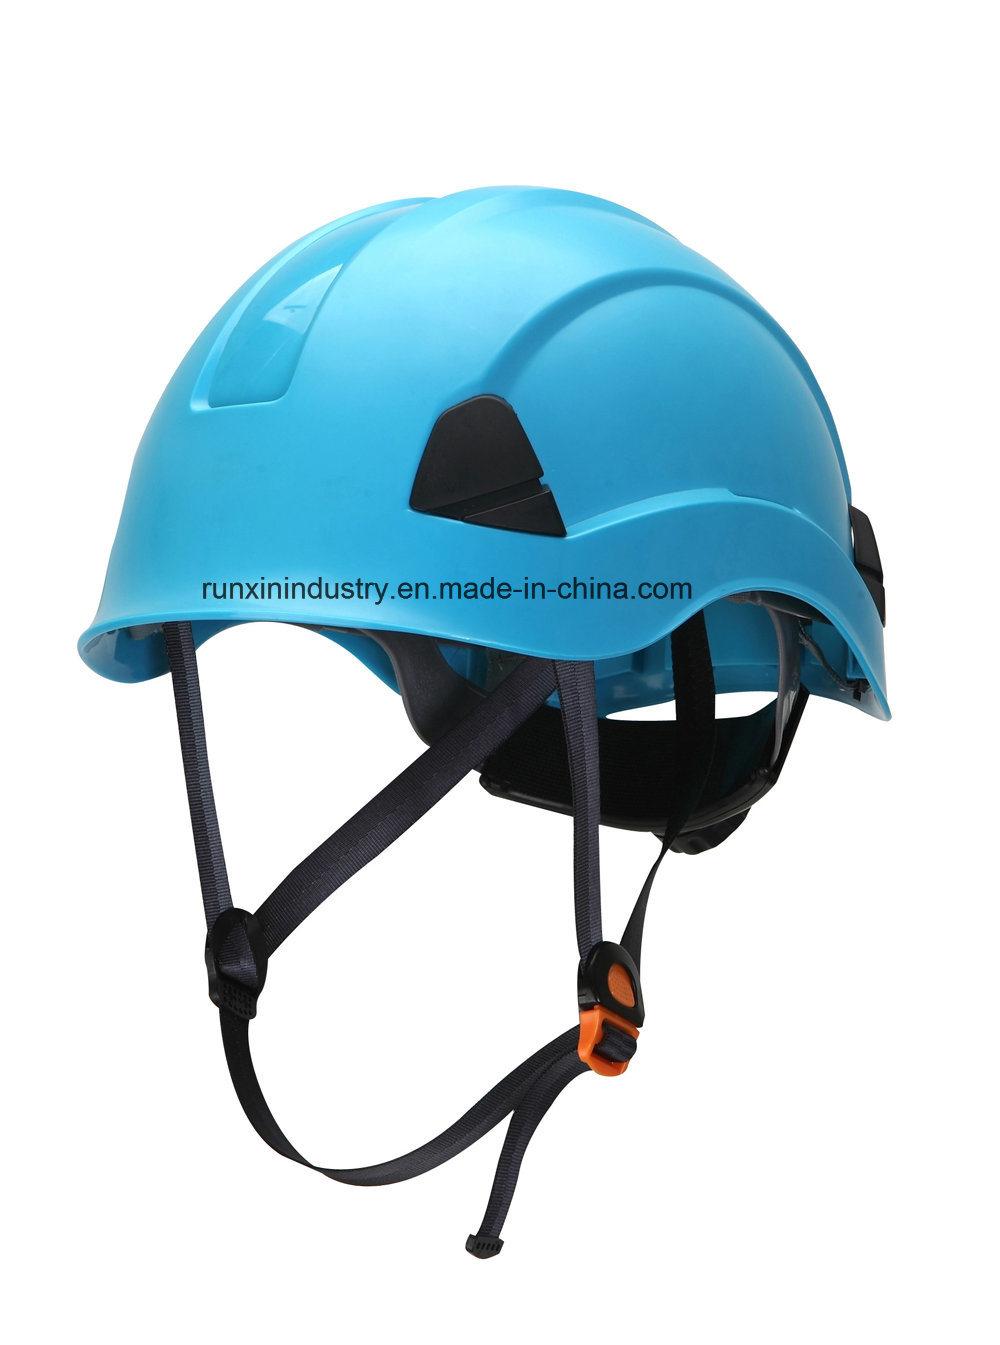 Working Aloft Safety Helmet ANSI Z89.1